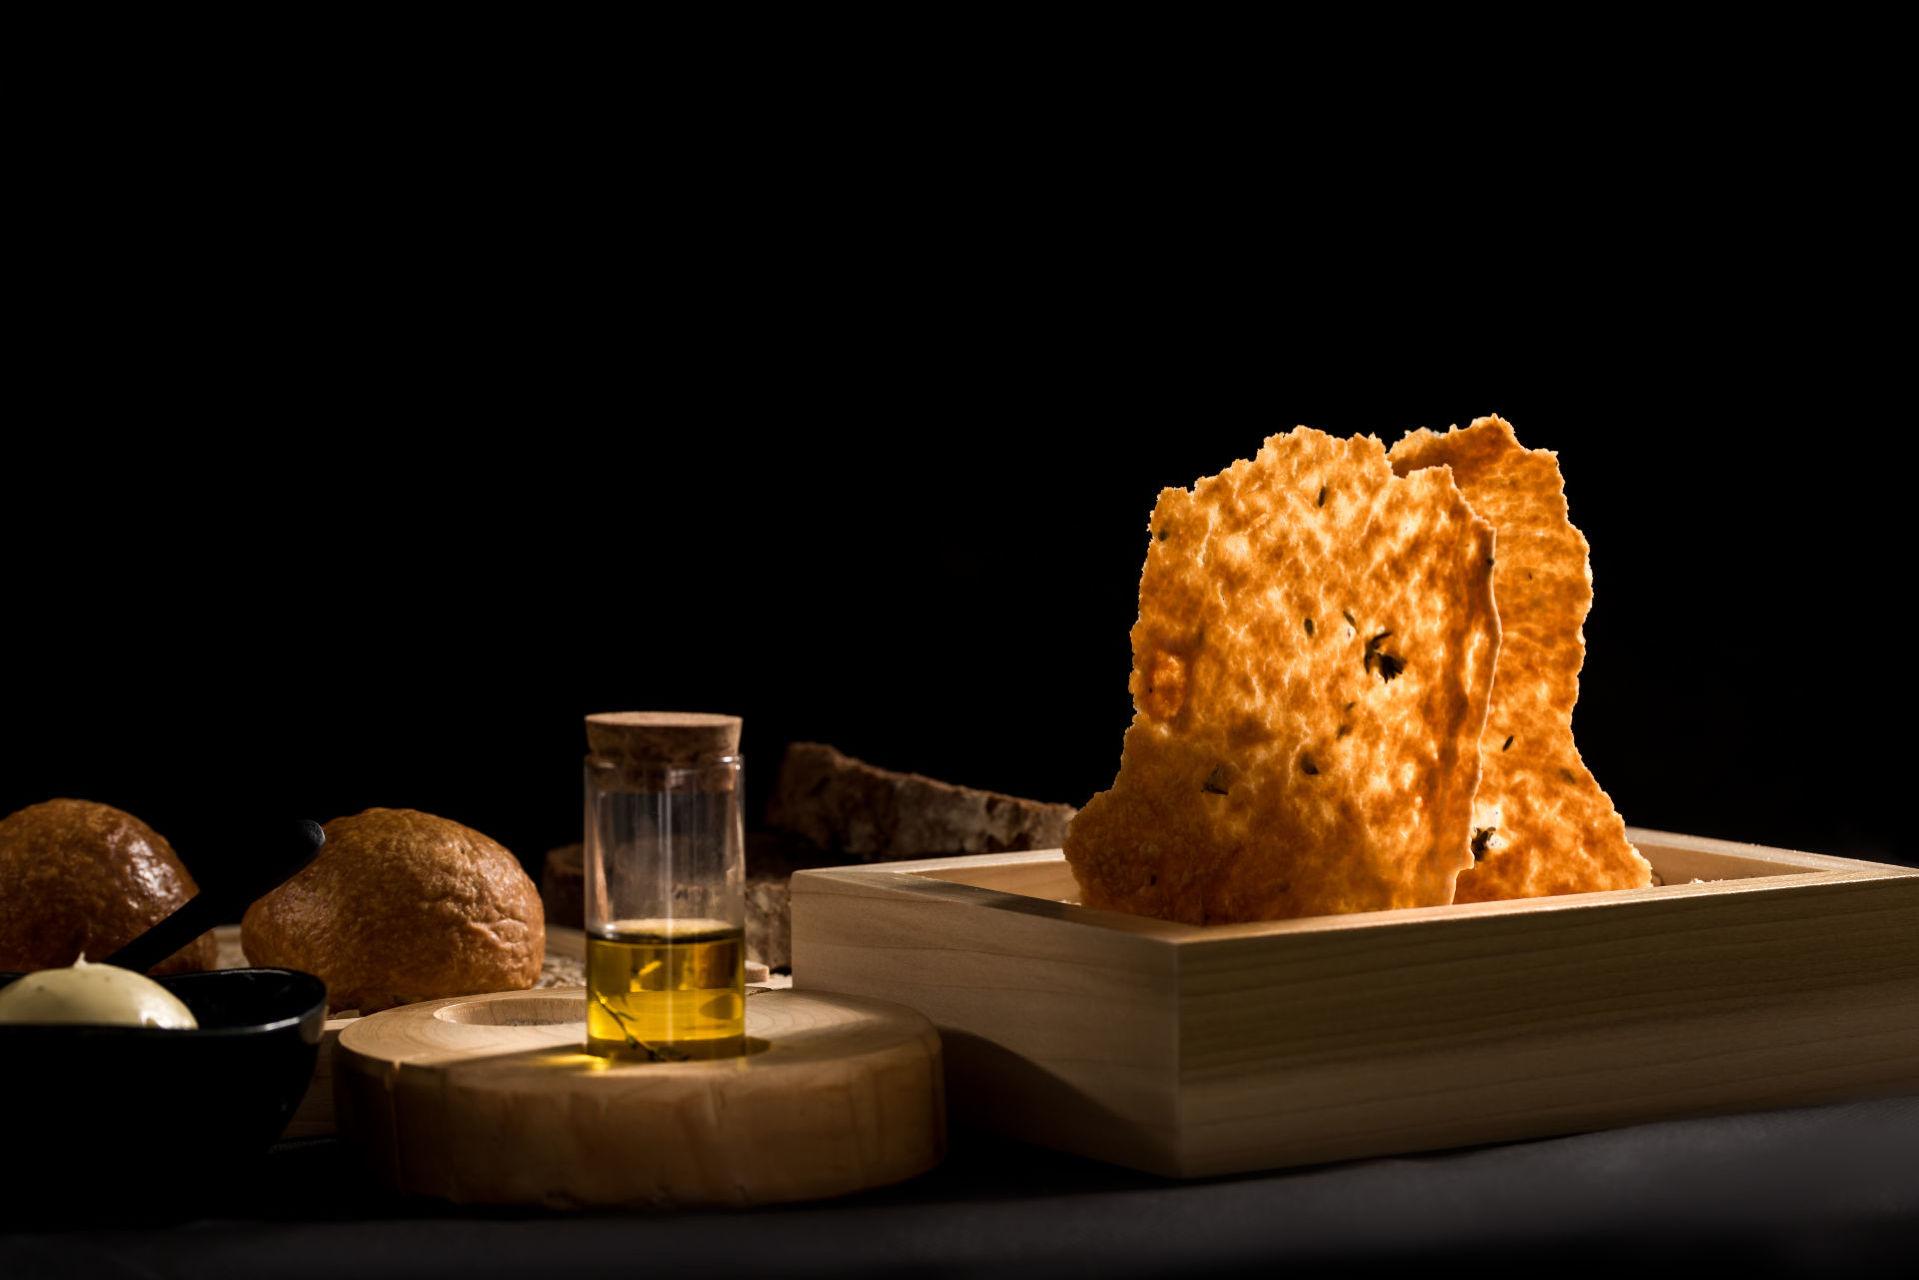 Alali_Restaurant_-_Fine_Dining_Experience_in_Santorini_4.jpg